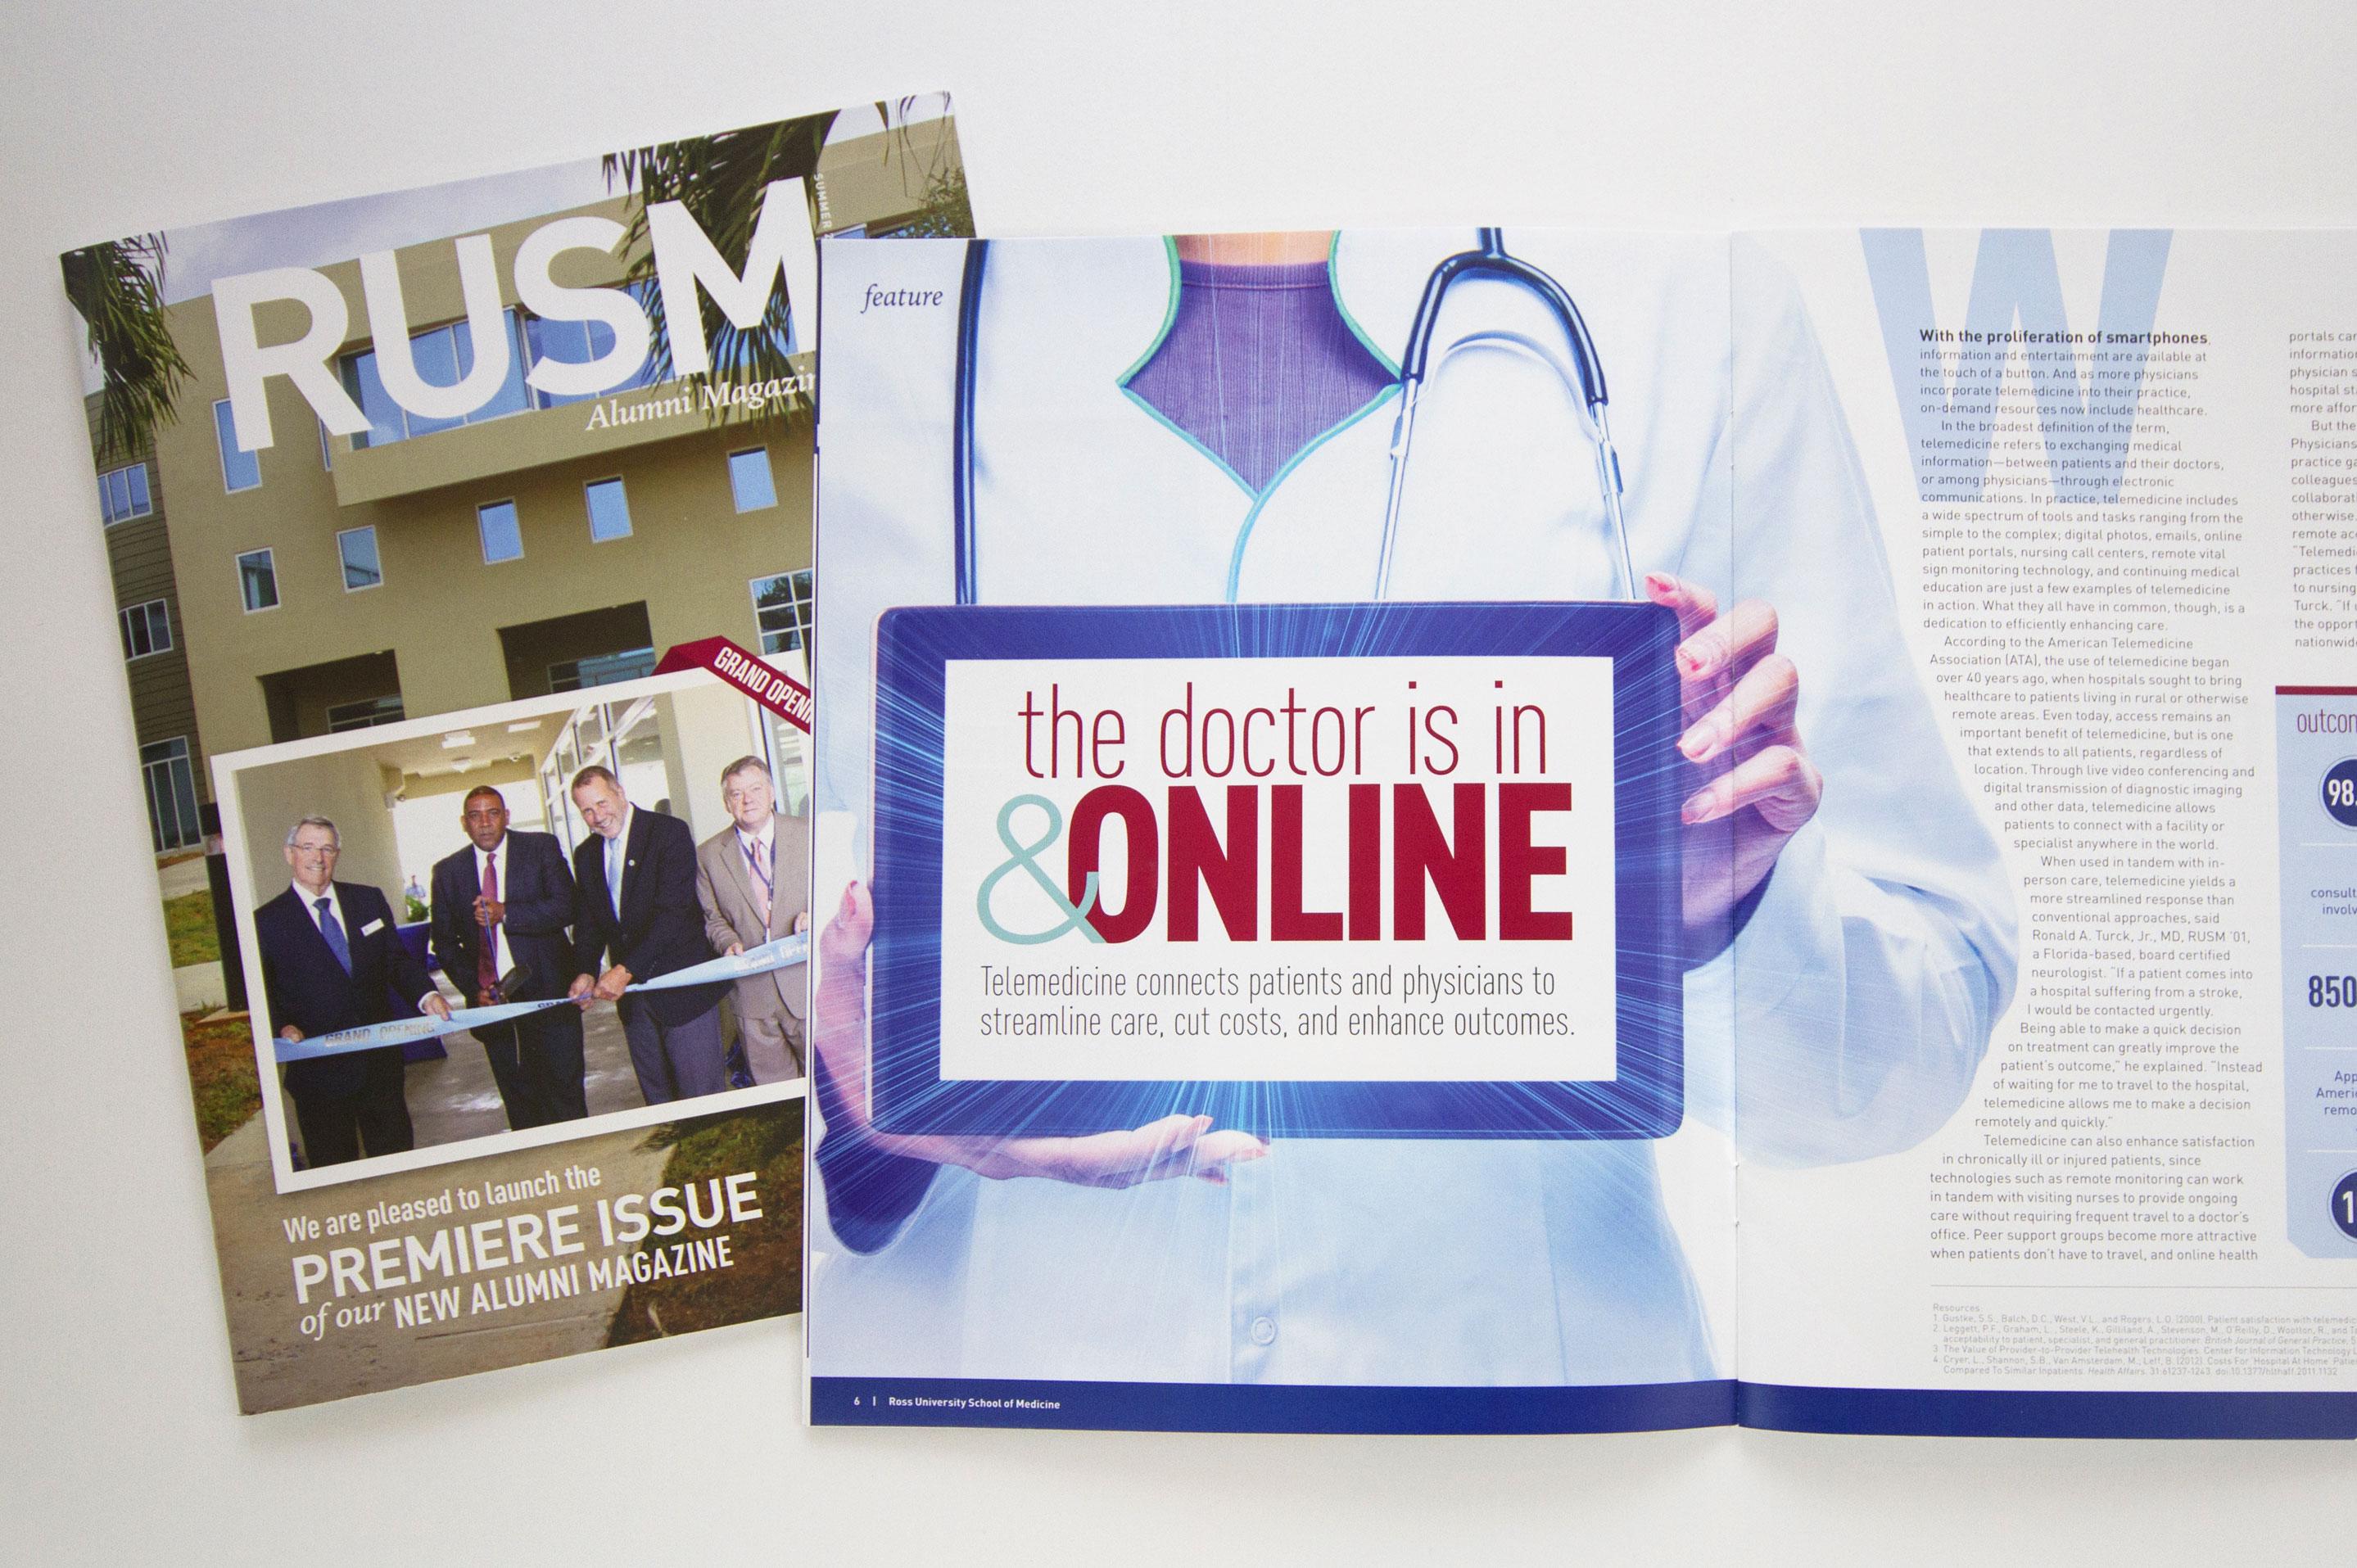 Ross University School of Medicine alumni magazine